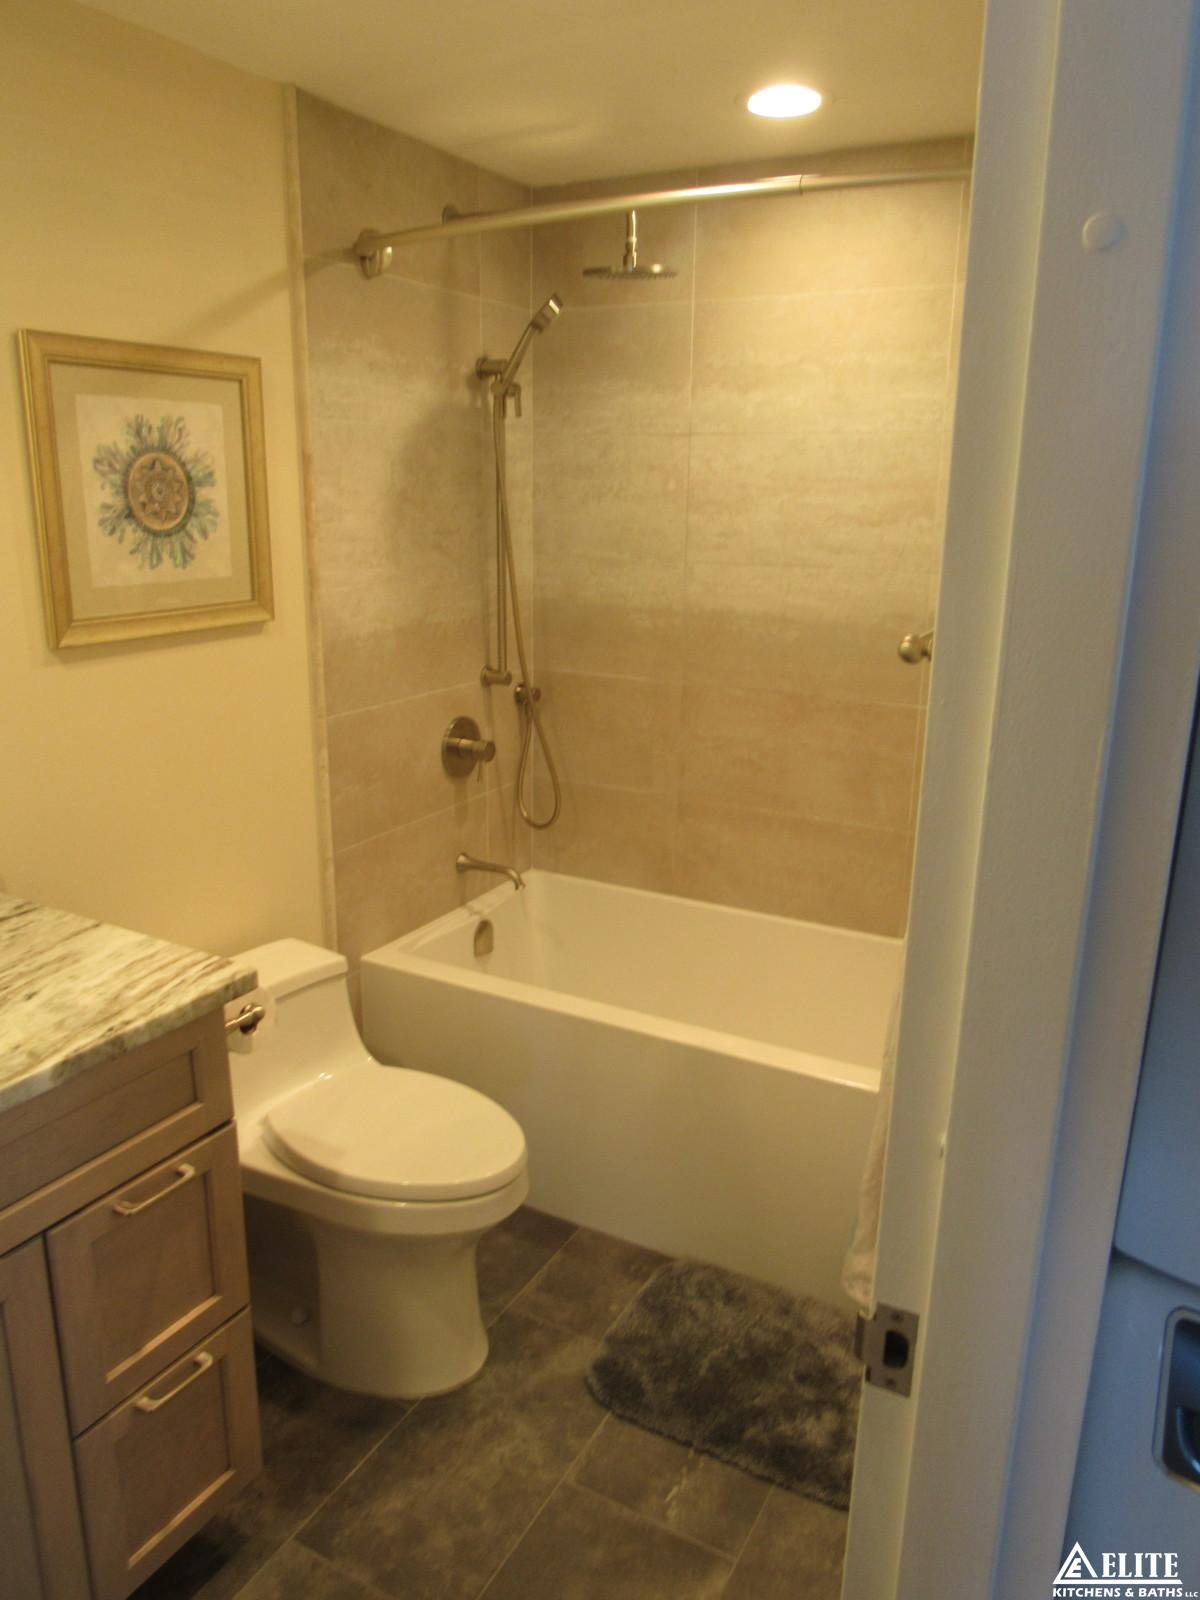 Bathrooms 110